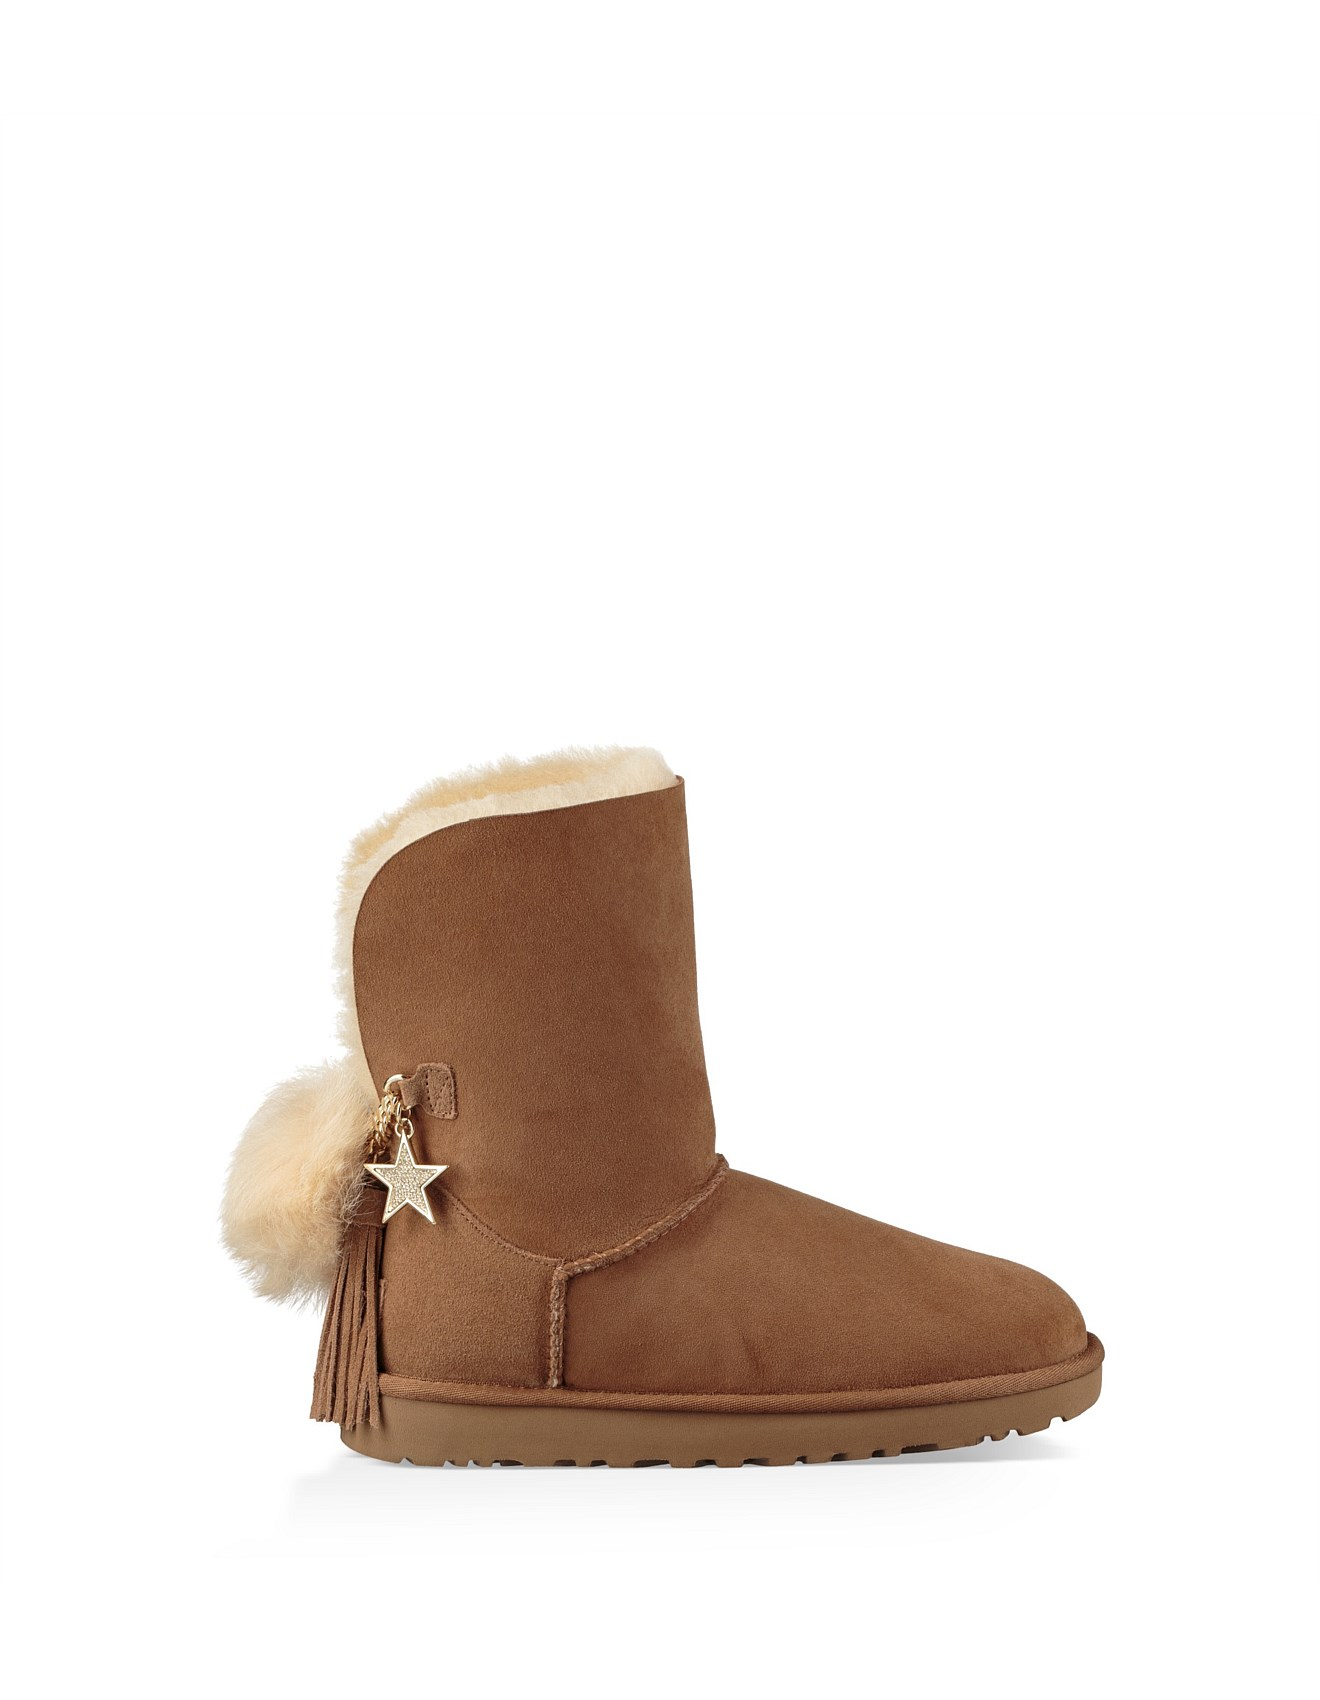 buy ugg boots online australia